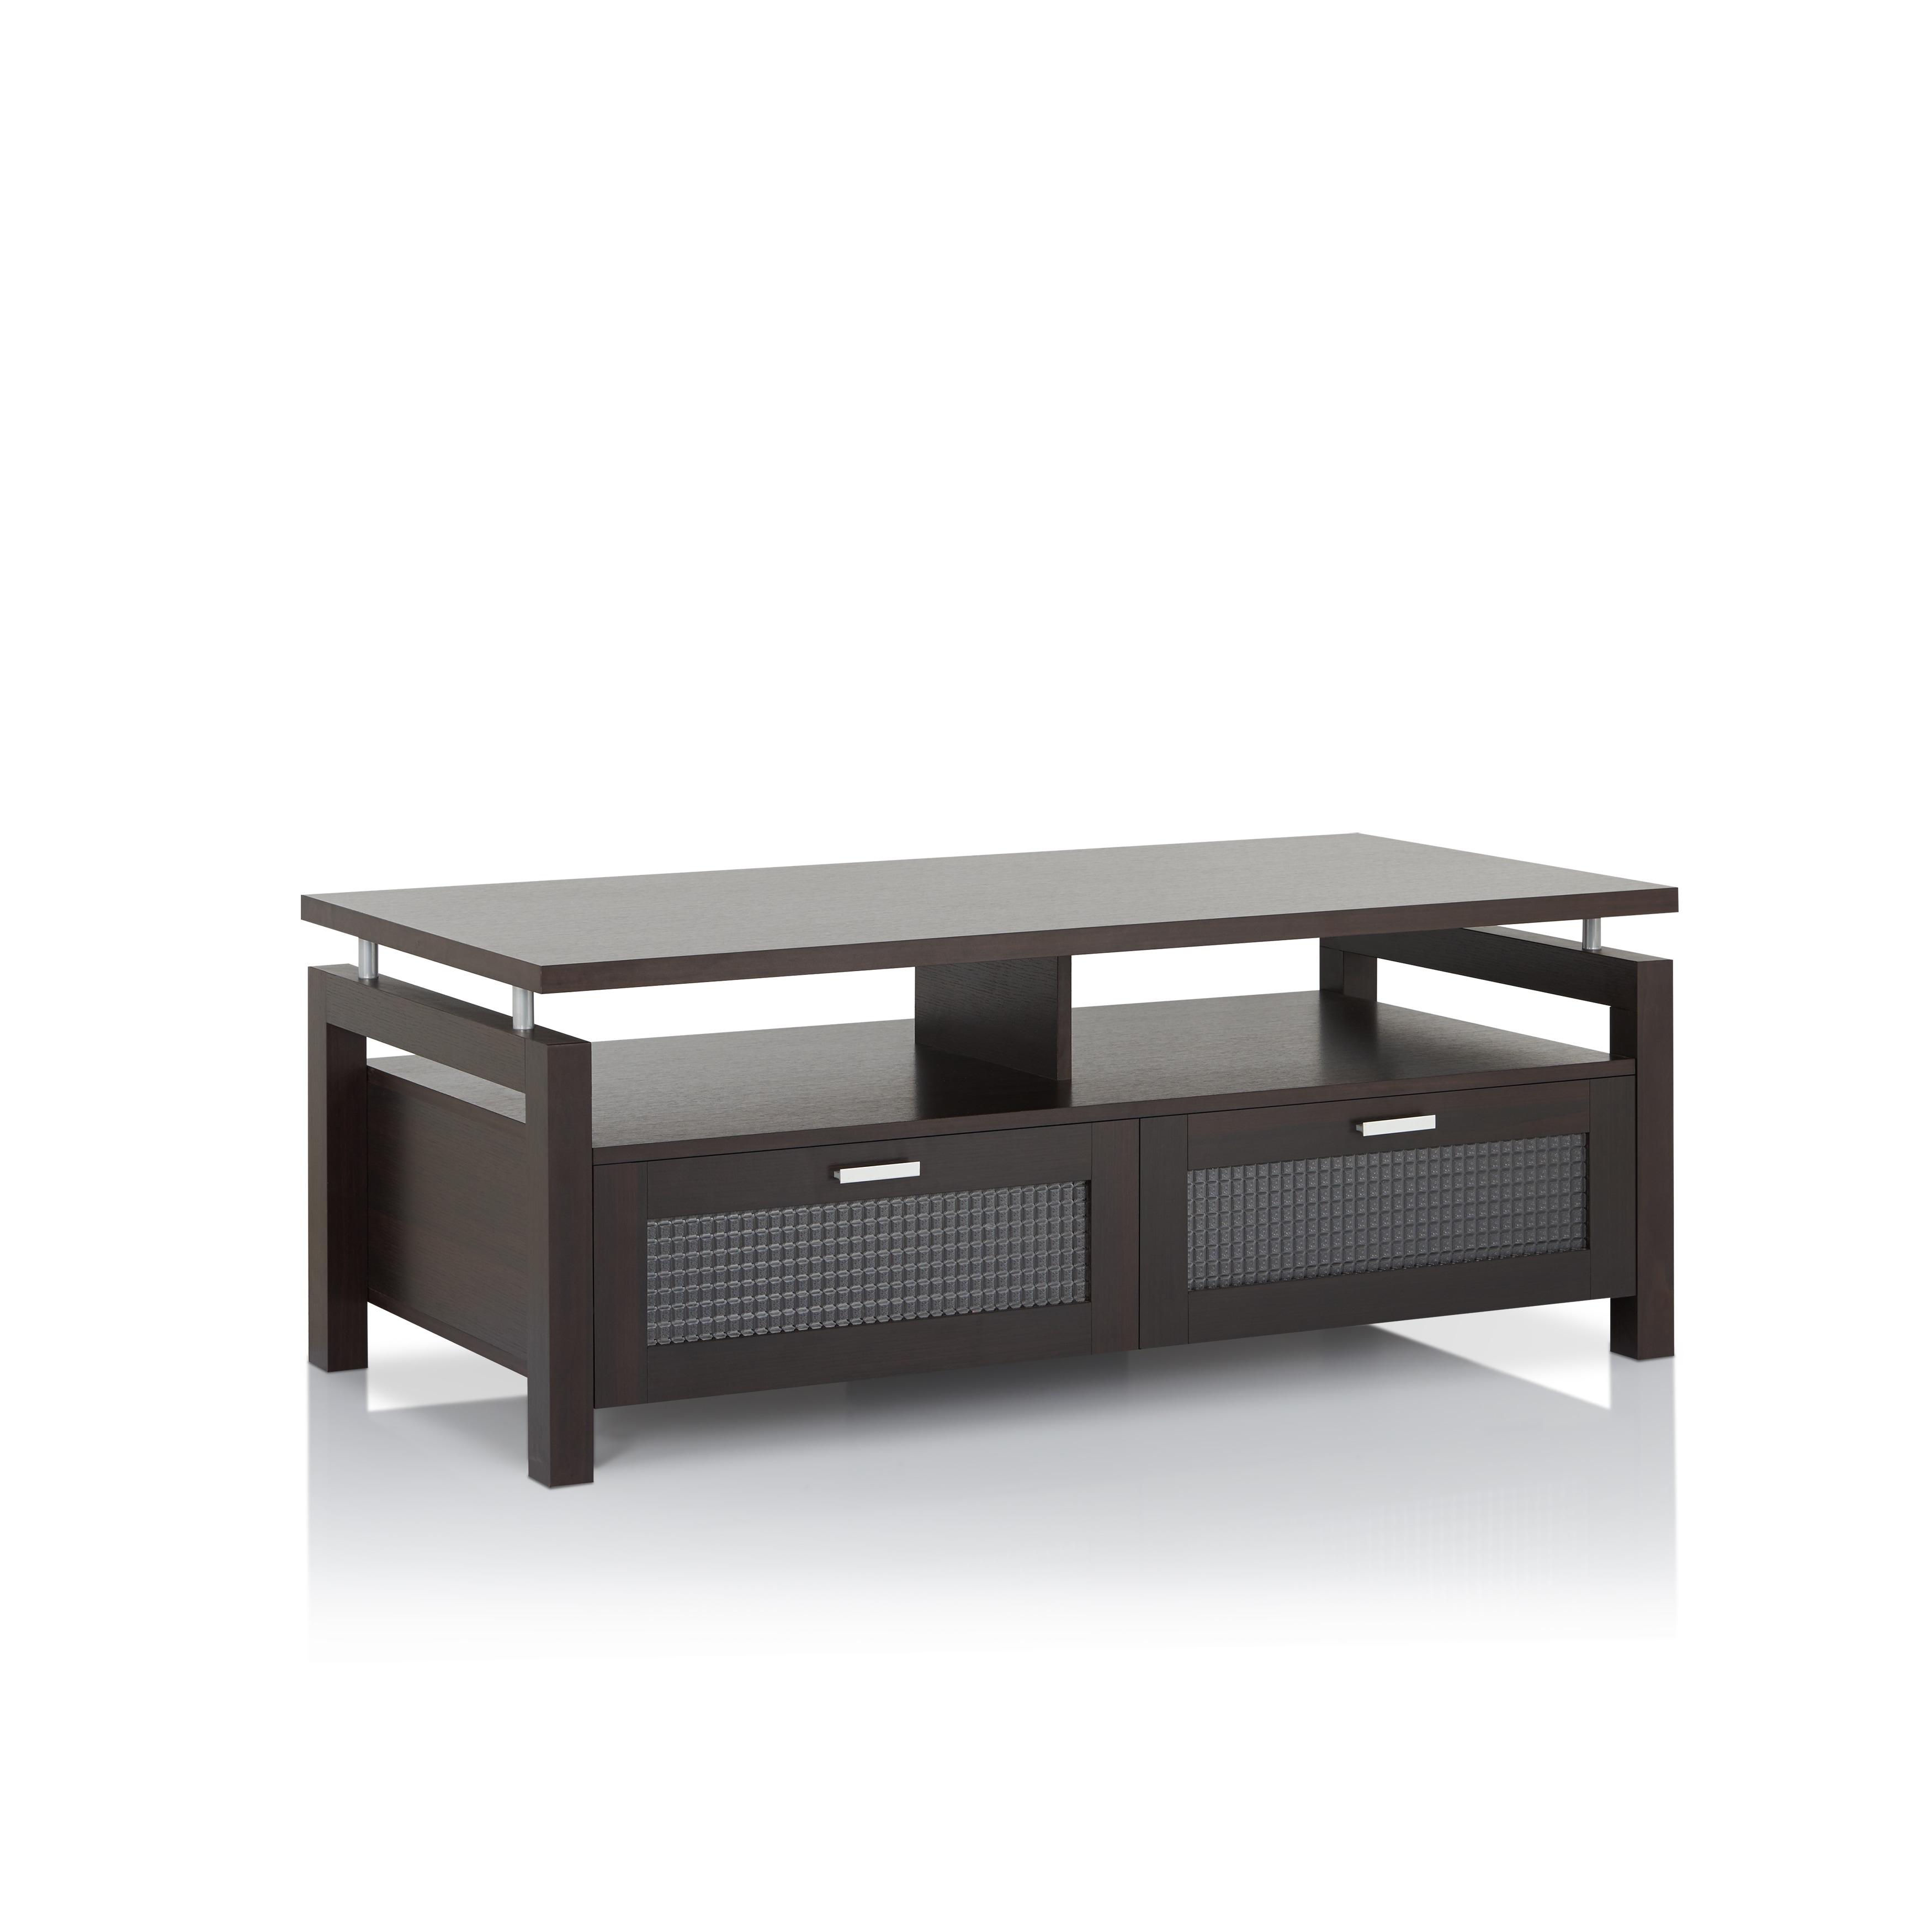 furniture of america bauston modern espresso storage coffee table  freeshipping today  overstockcom  . furniture of america bauston modern espresso storage coffee table